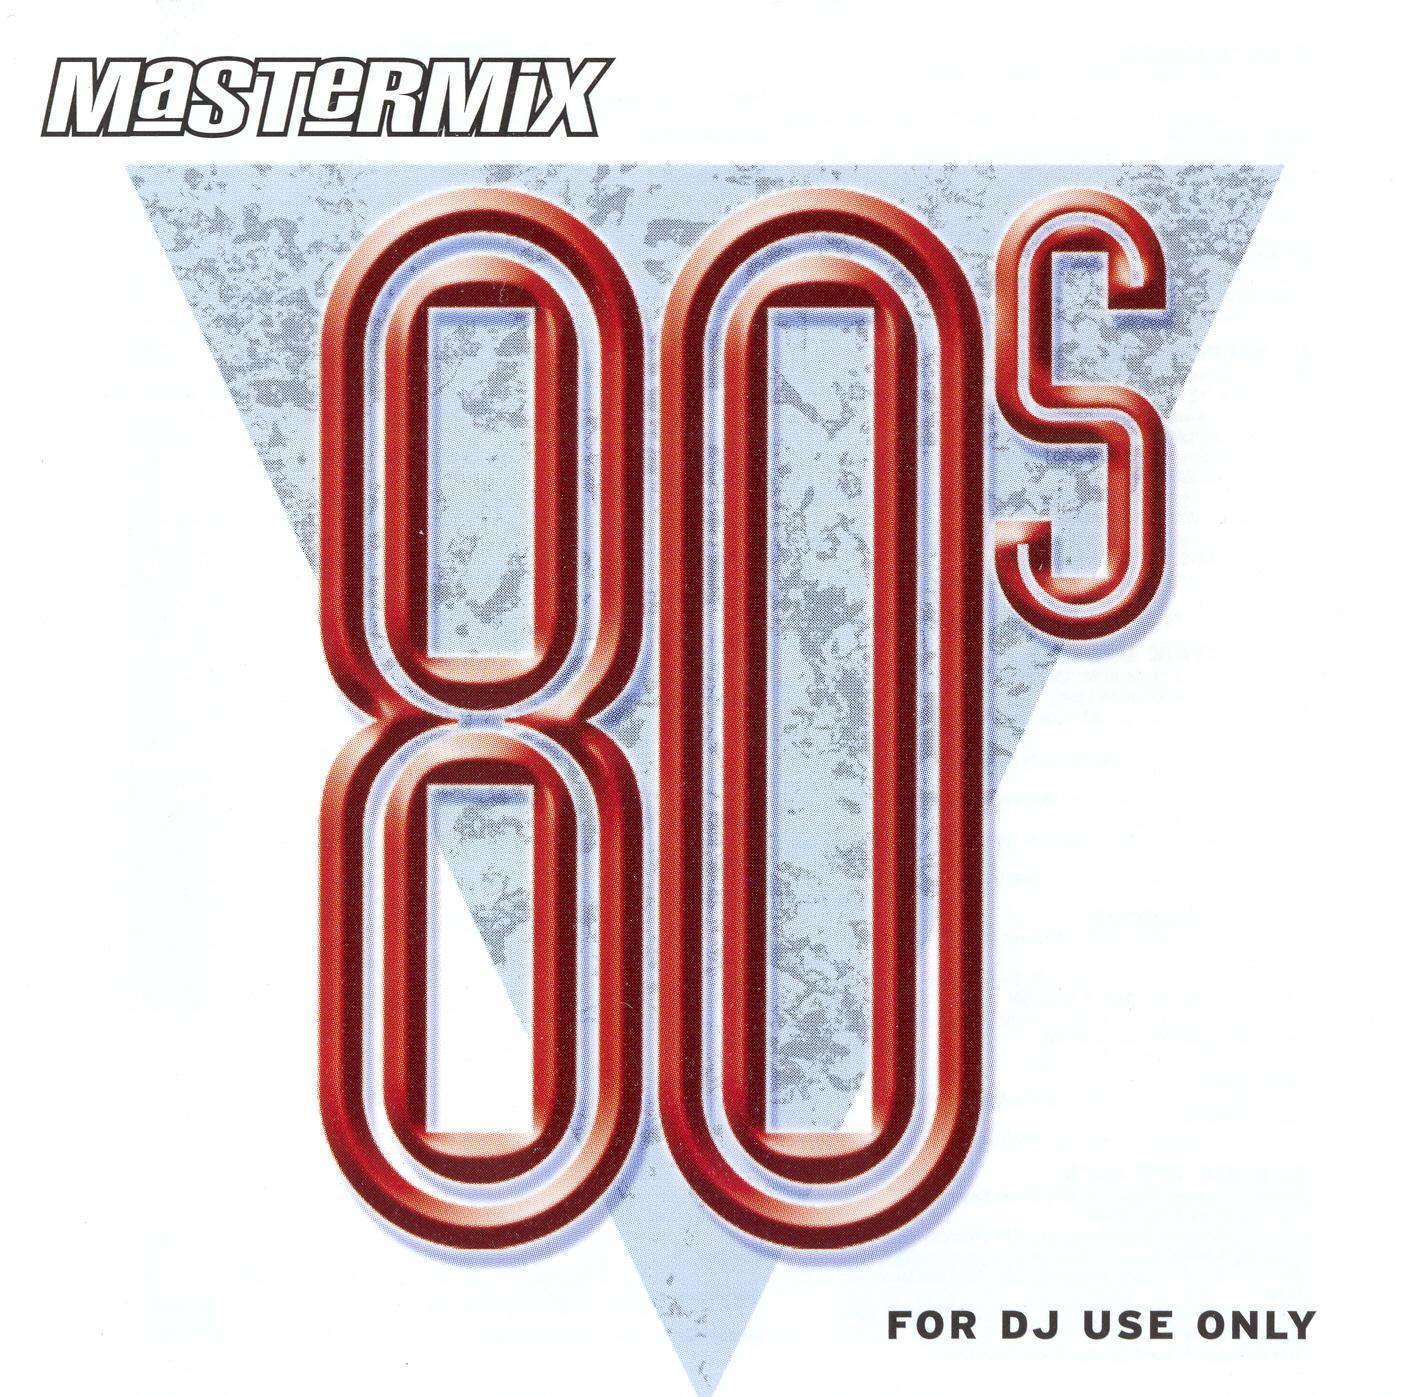 Mastermix - 80s